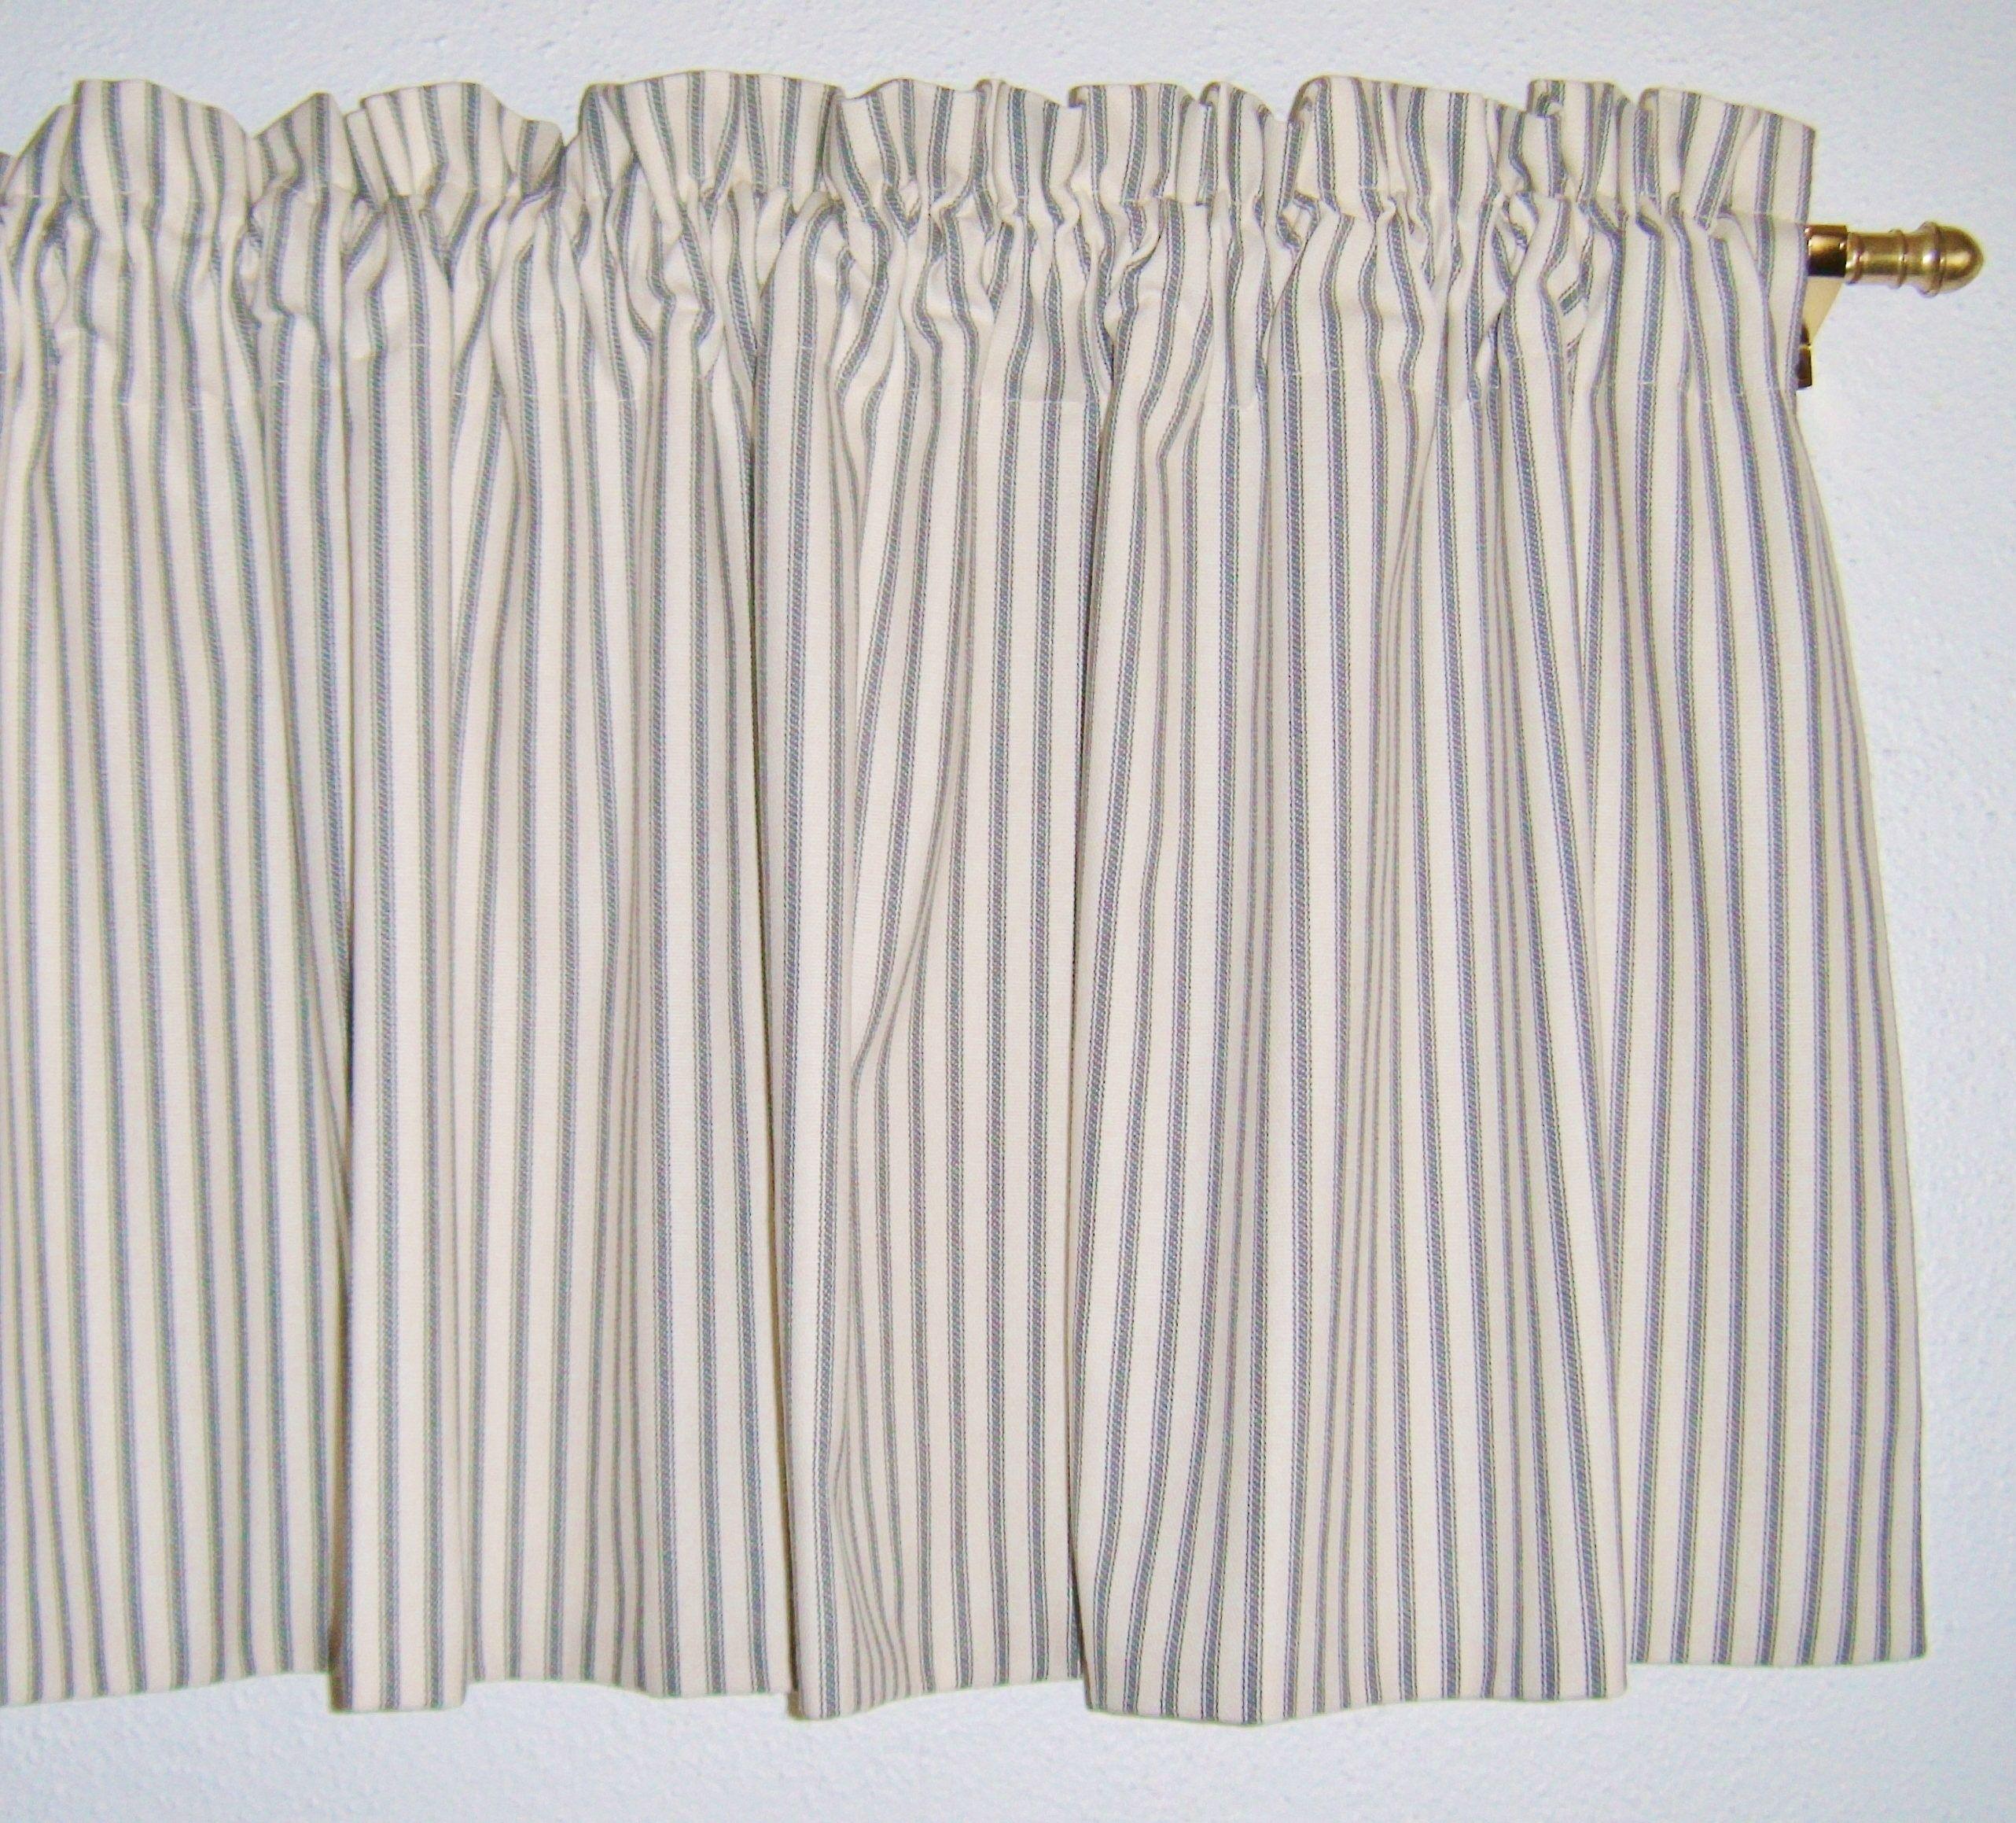 Ticking Stripe Window Valance, Gray, Red, Black, Aqua, Brown, Blue